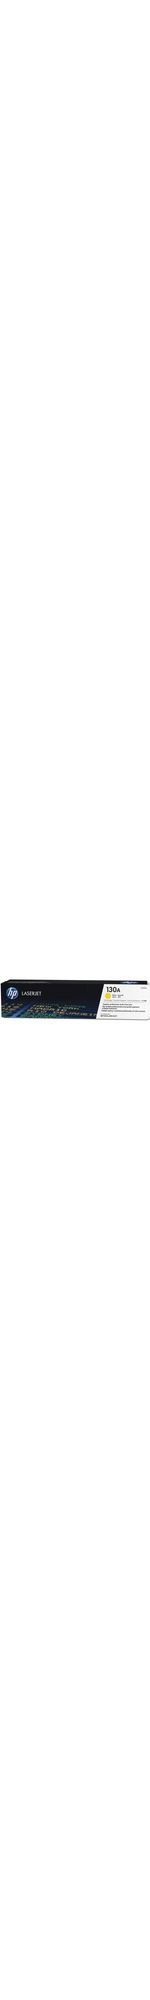 HP 130A Toner Cartridge - Yellow